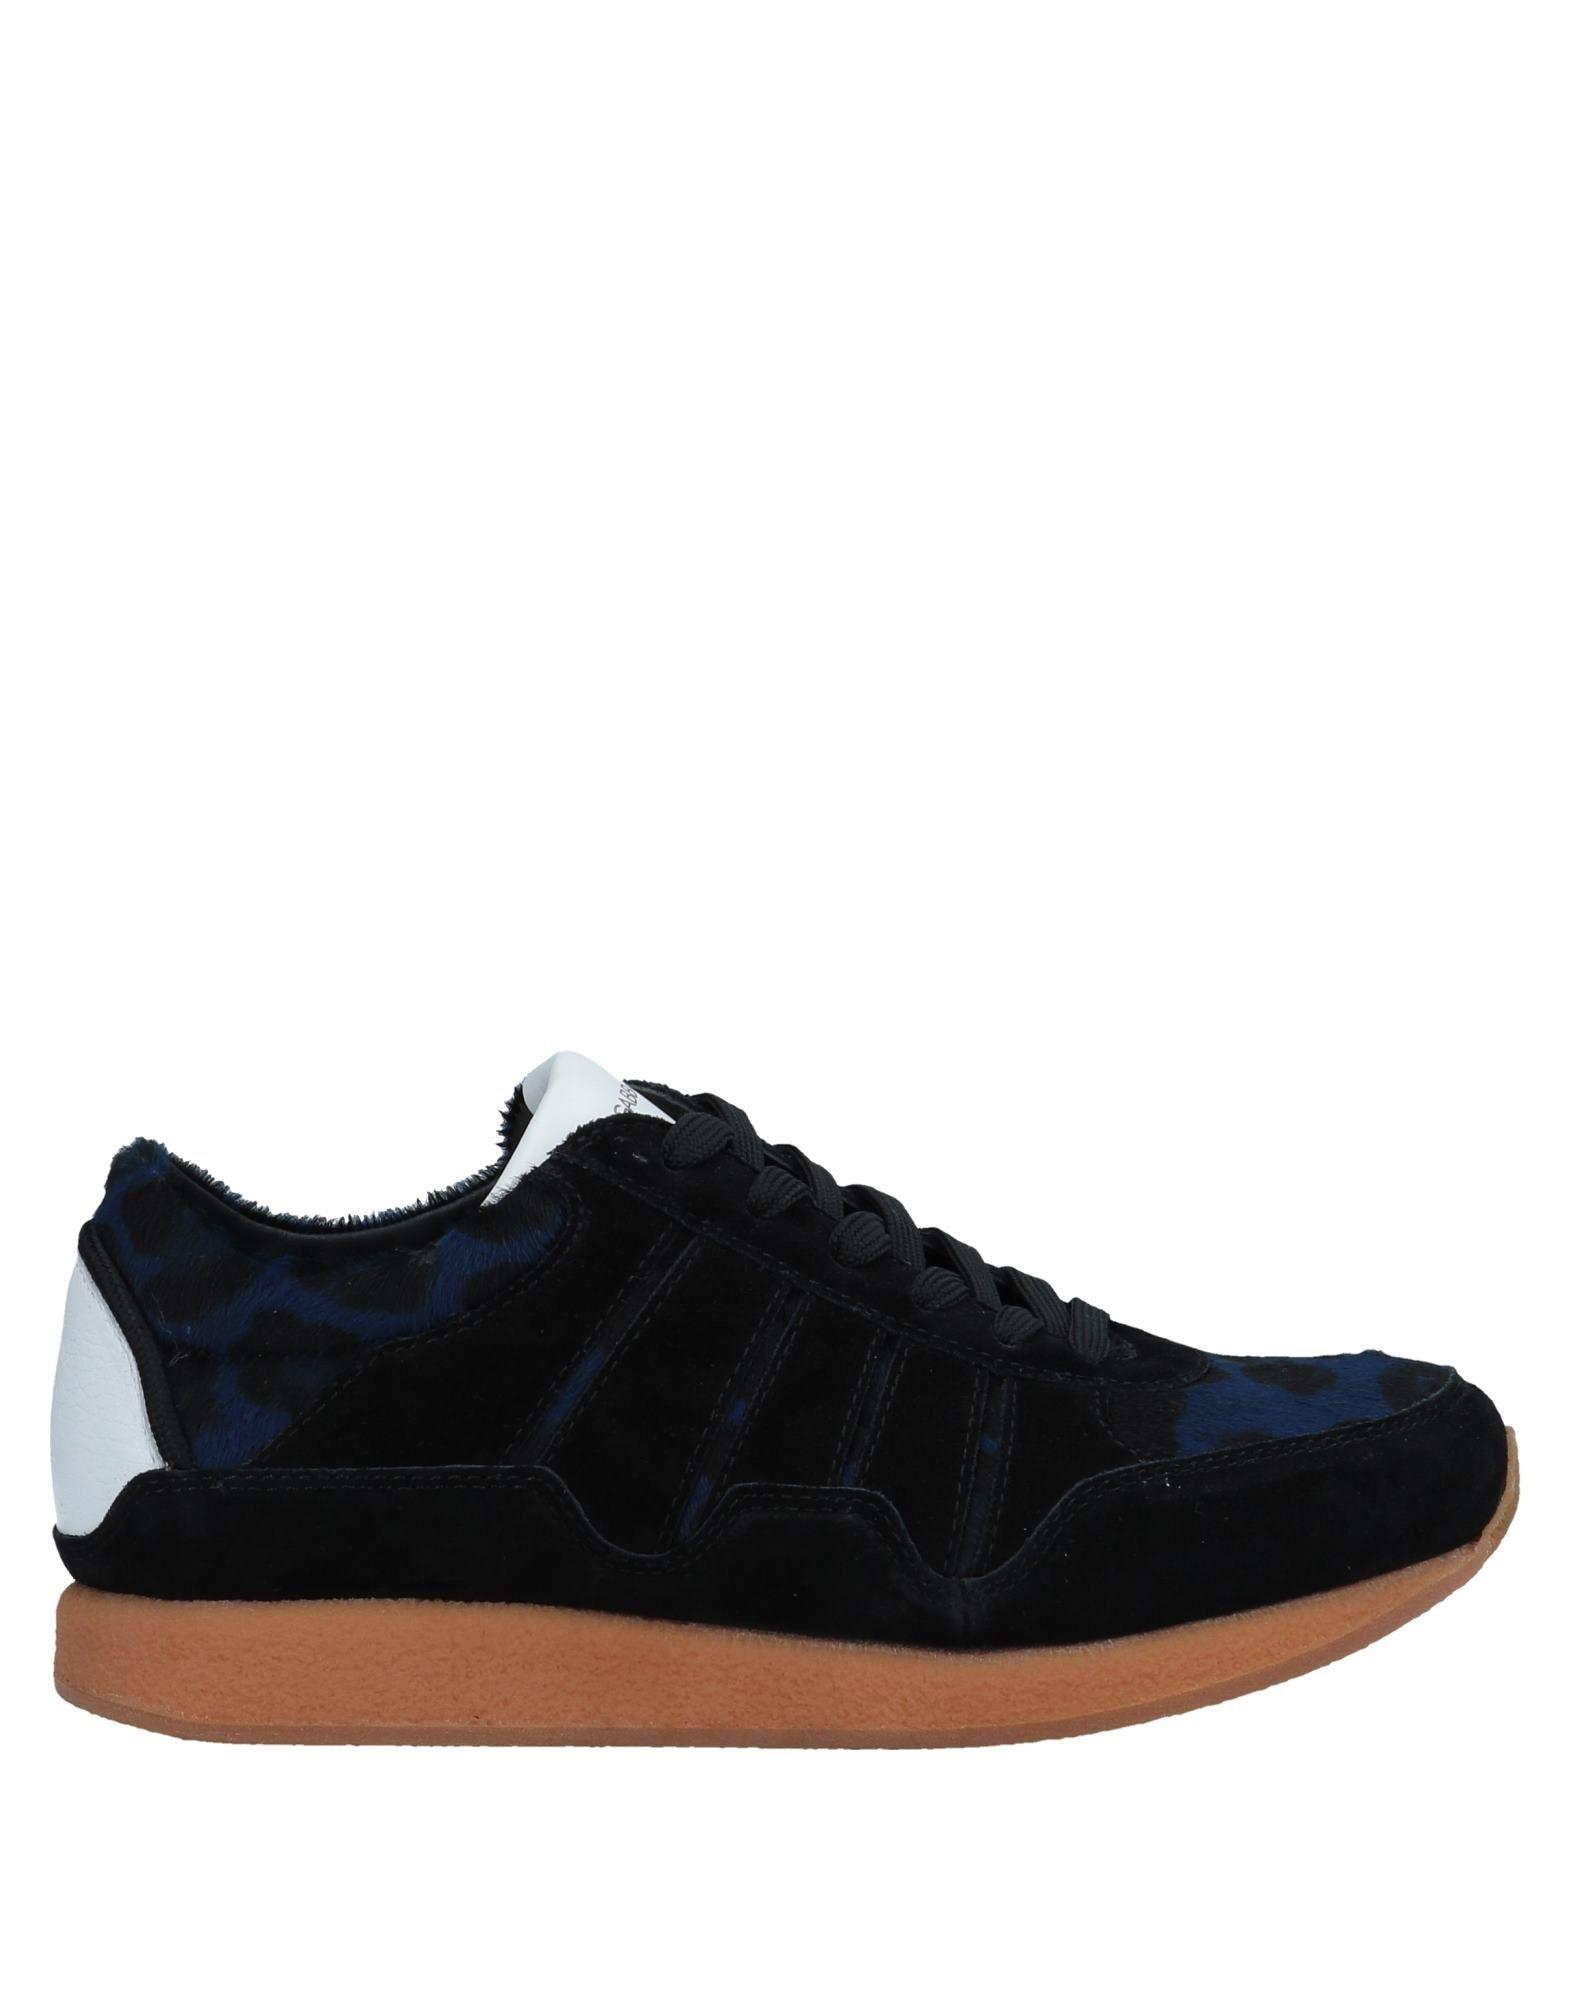 Dolce & Gabbana Sneakers - Sneakers Men Dolce & Gabbana Sneakers - online on  United Kingdom - 11035221RL 5e6cc8